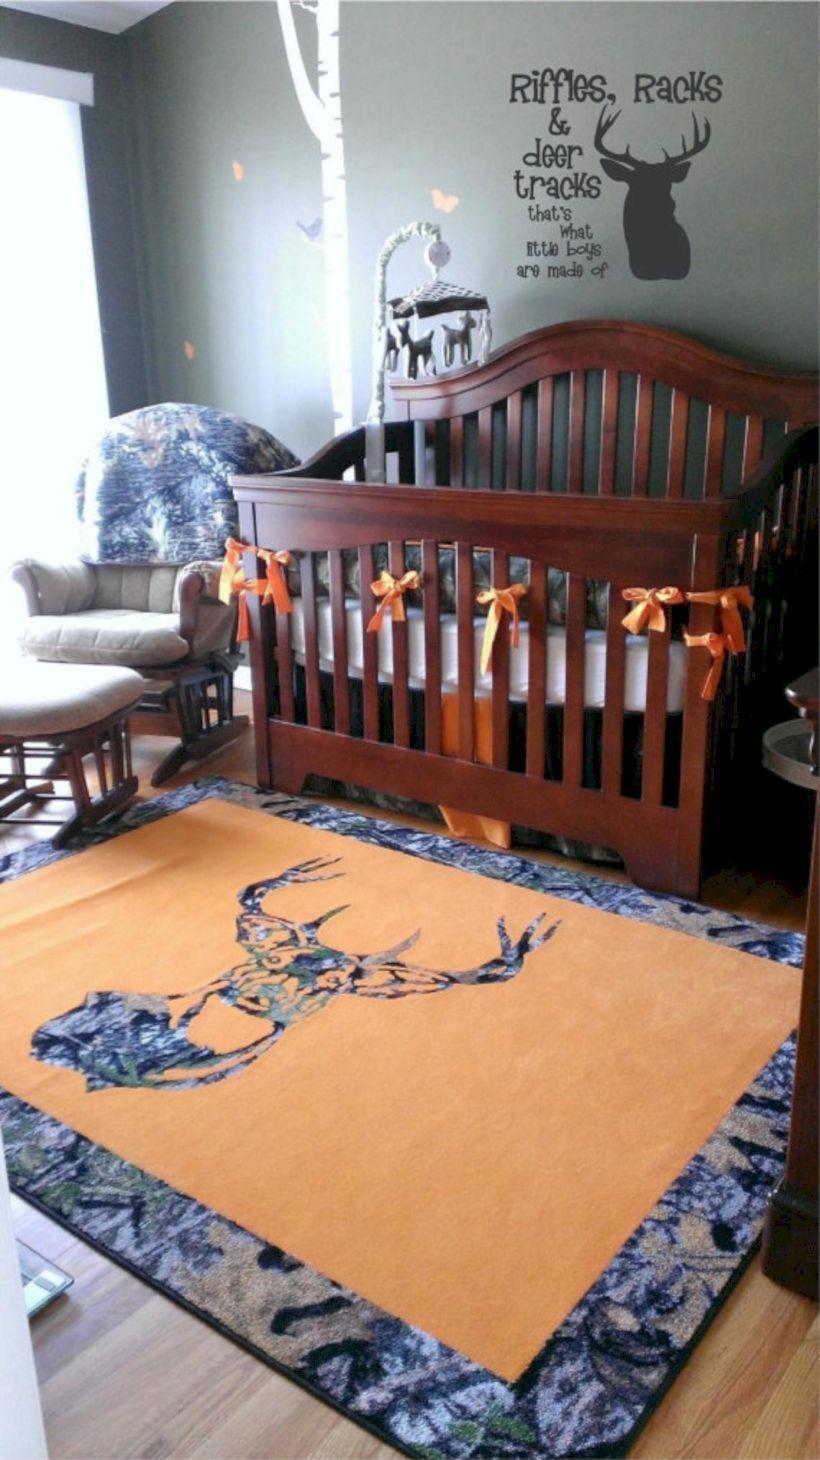 Pin On Baby Baby camo bedroom decor